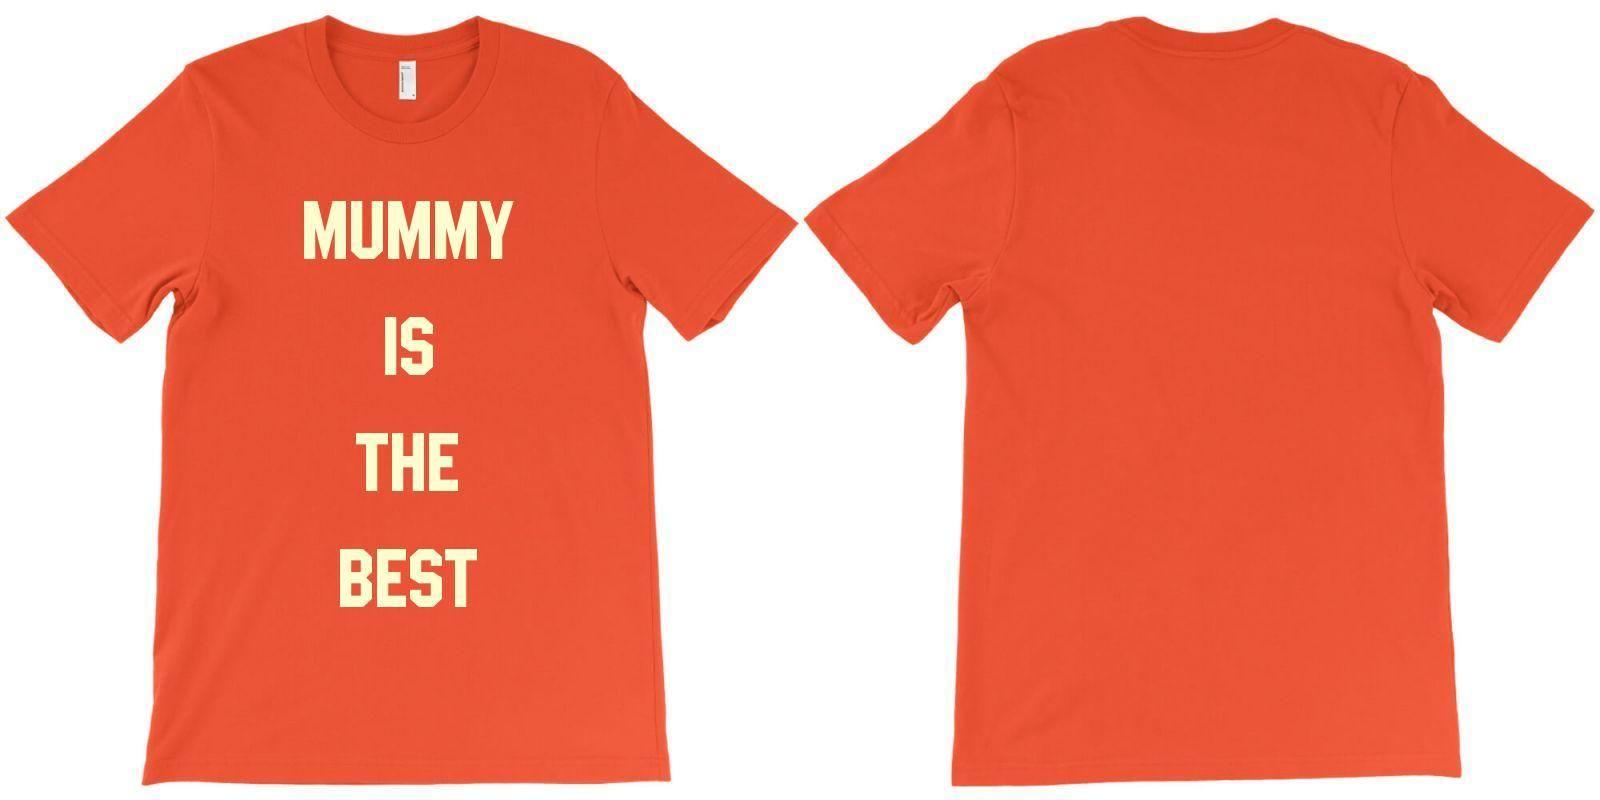 Tshirt artistshot laboratory make your own shirt